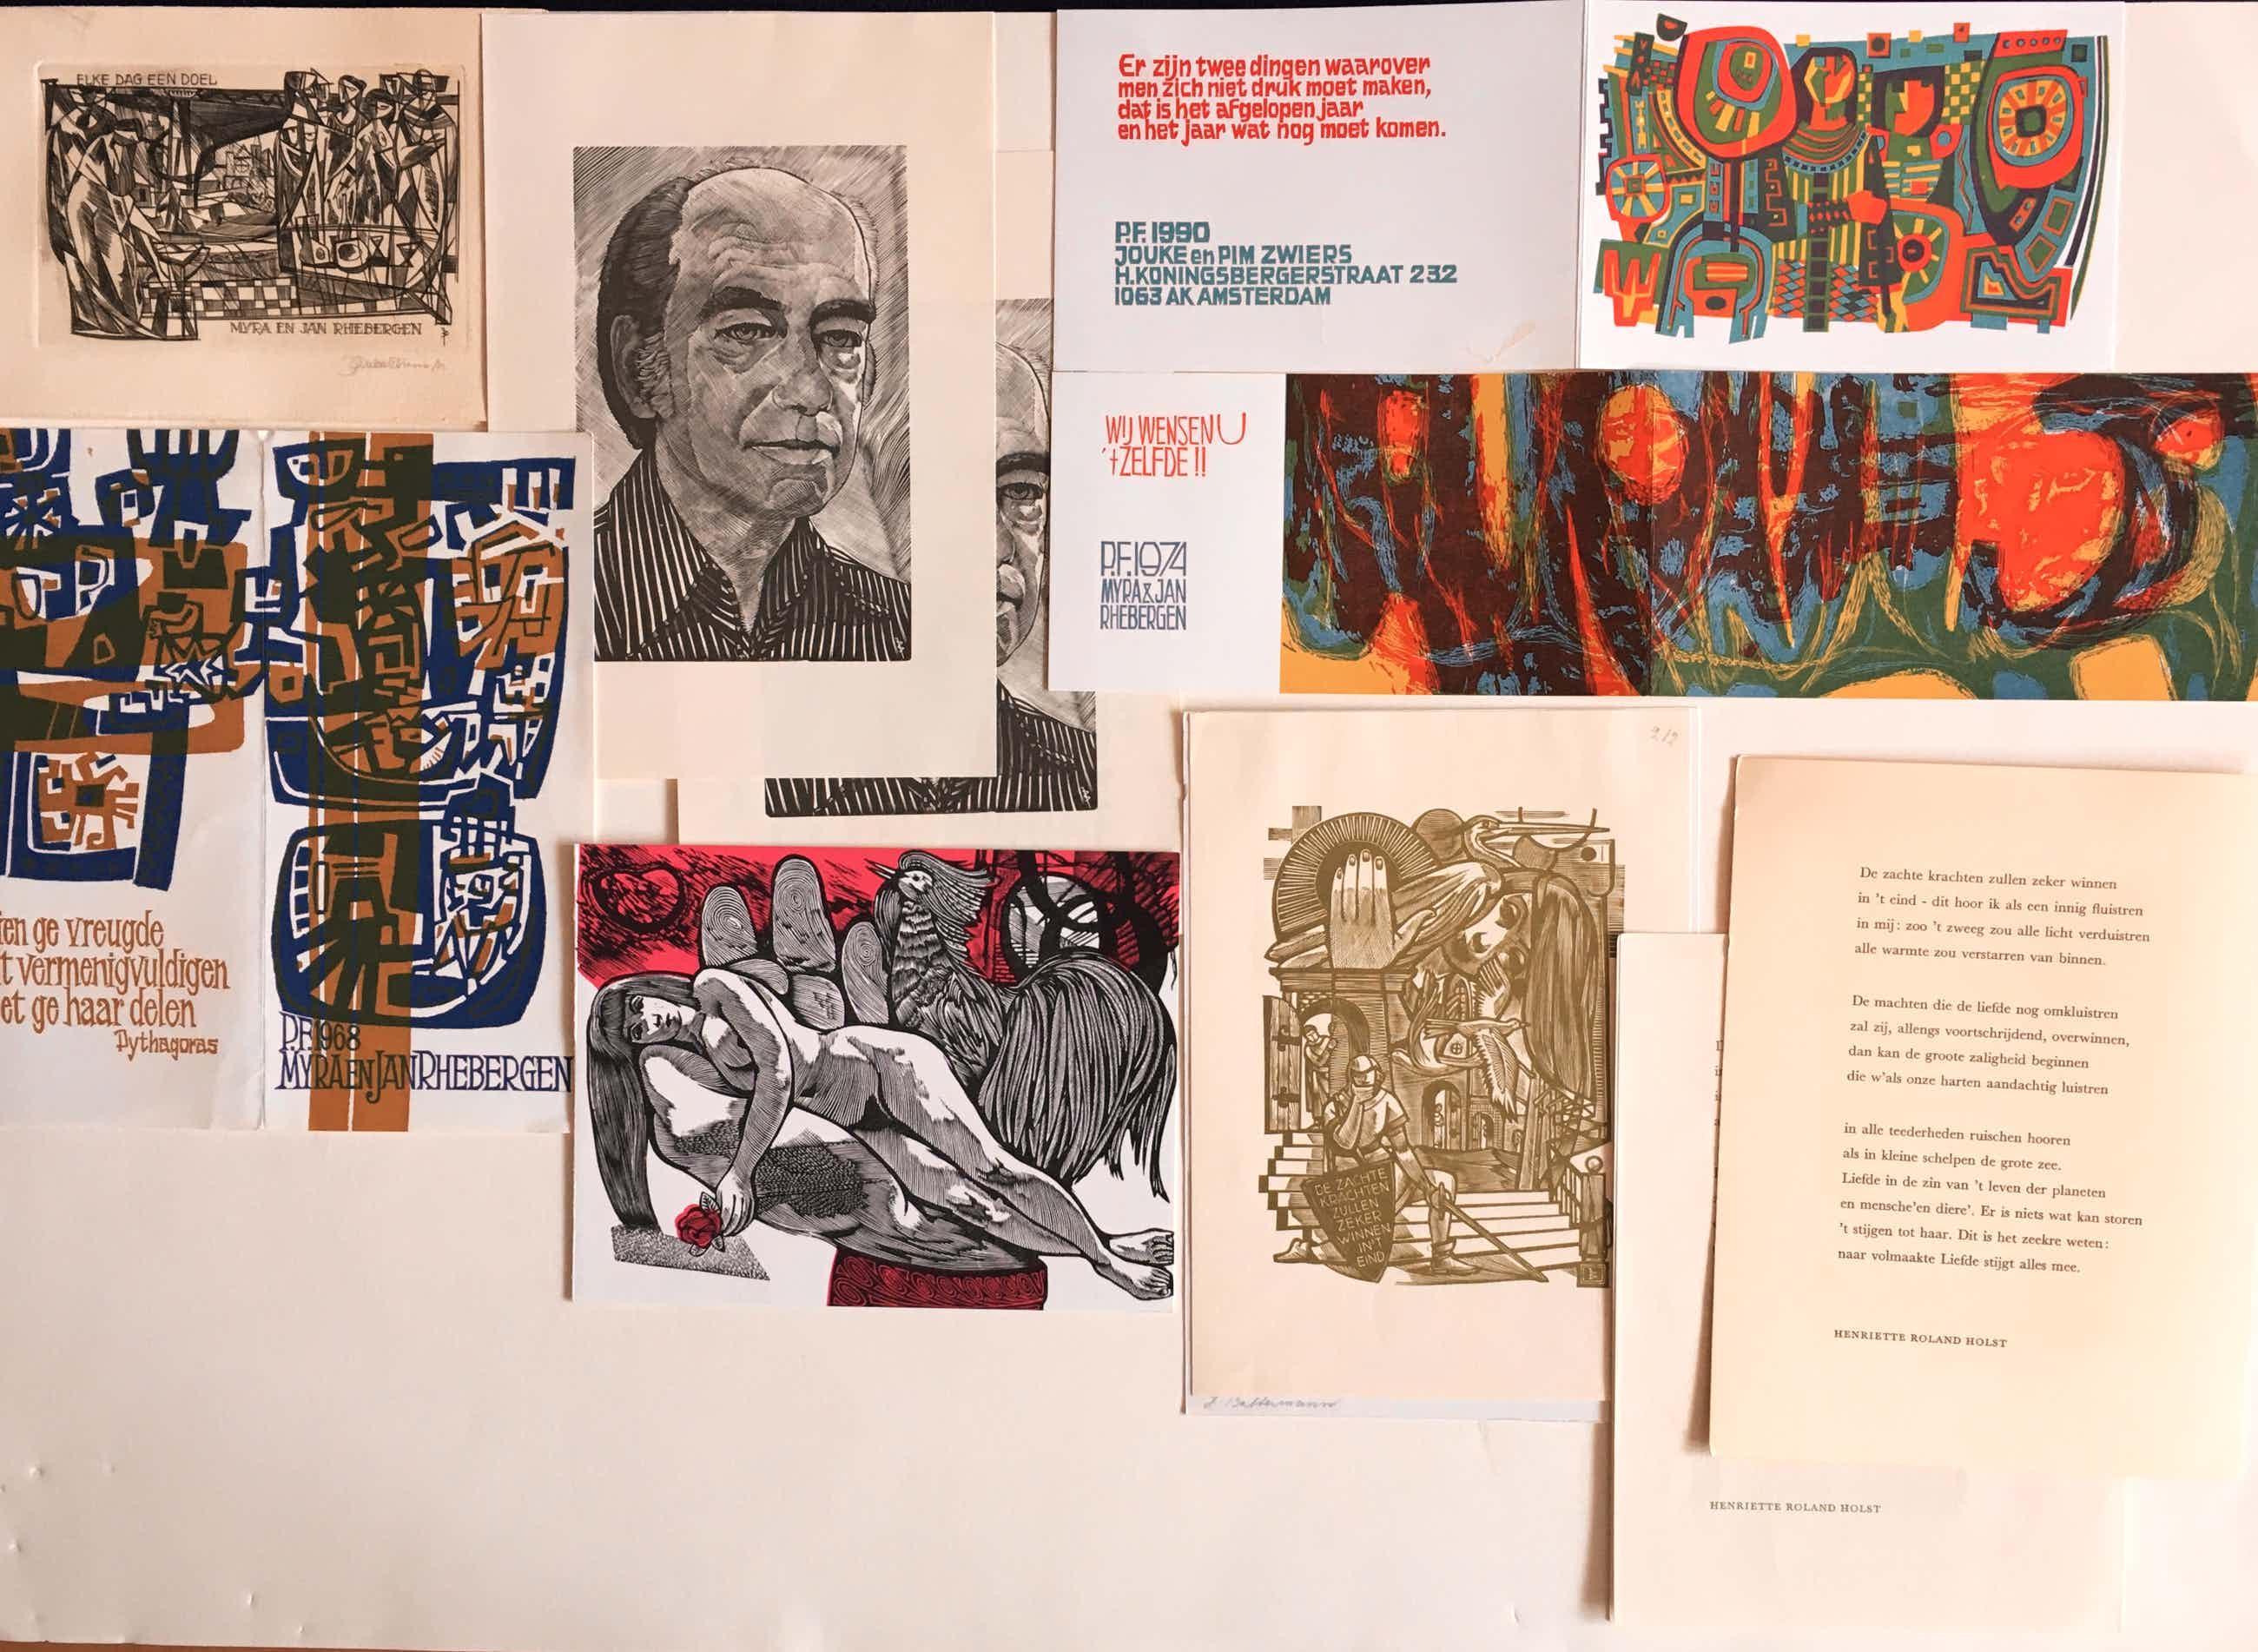 Jan Battermann - 58 st. kleingrafiek: Gravures, houtgravures en lino's kopen? Bied vanaf 44!